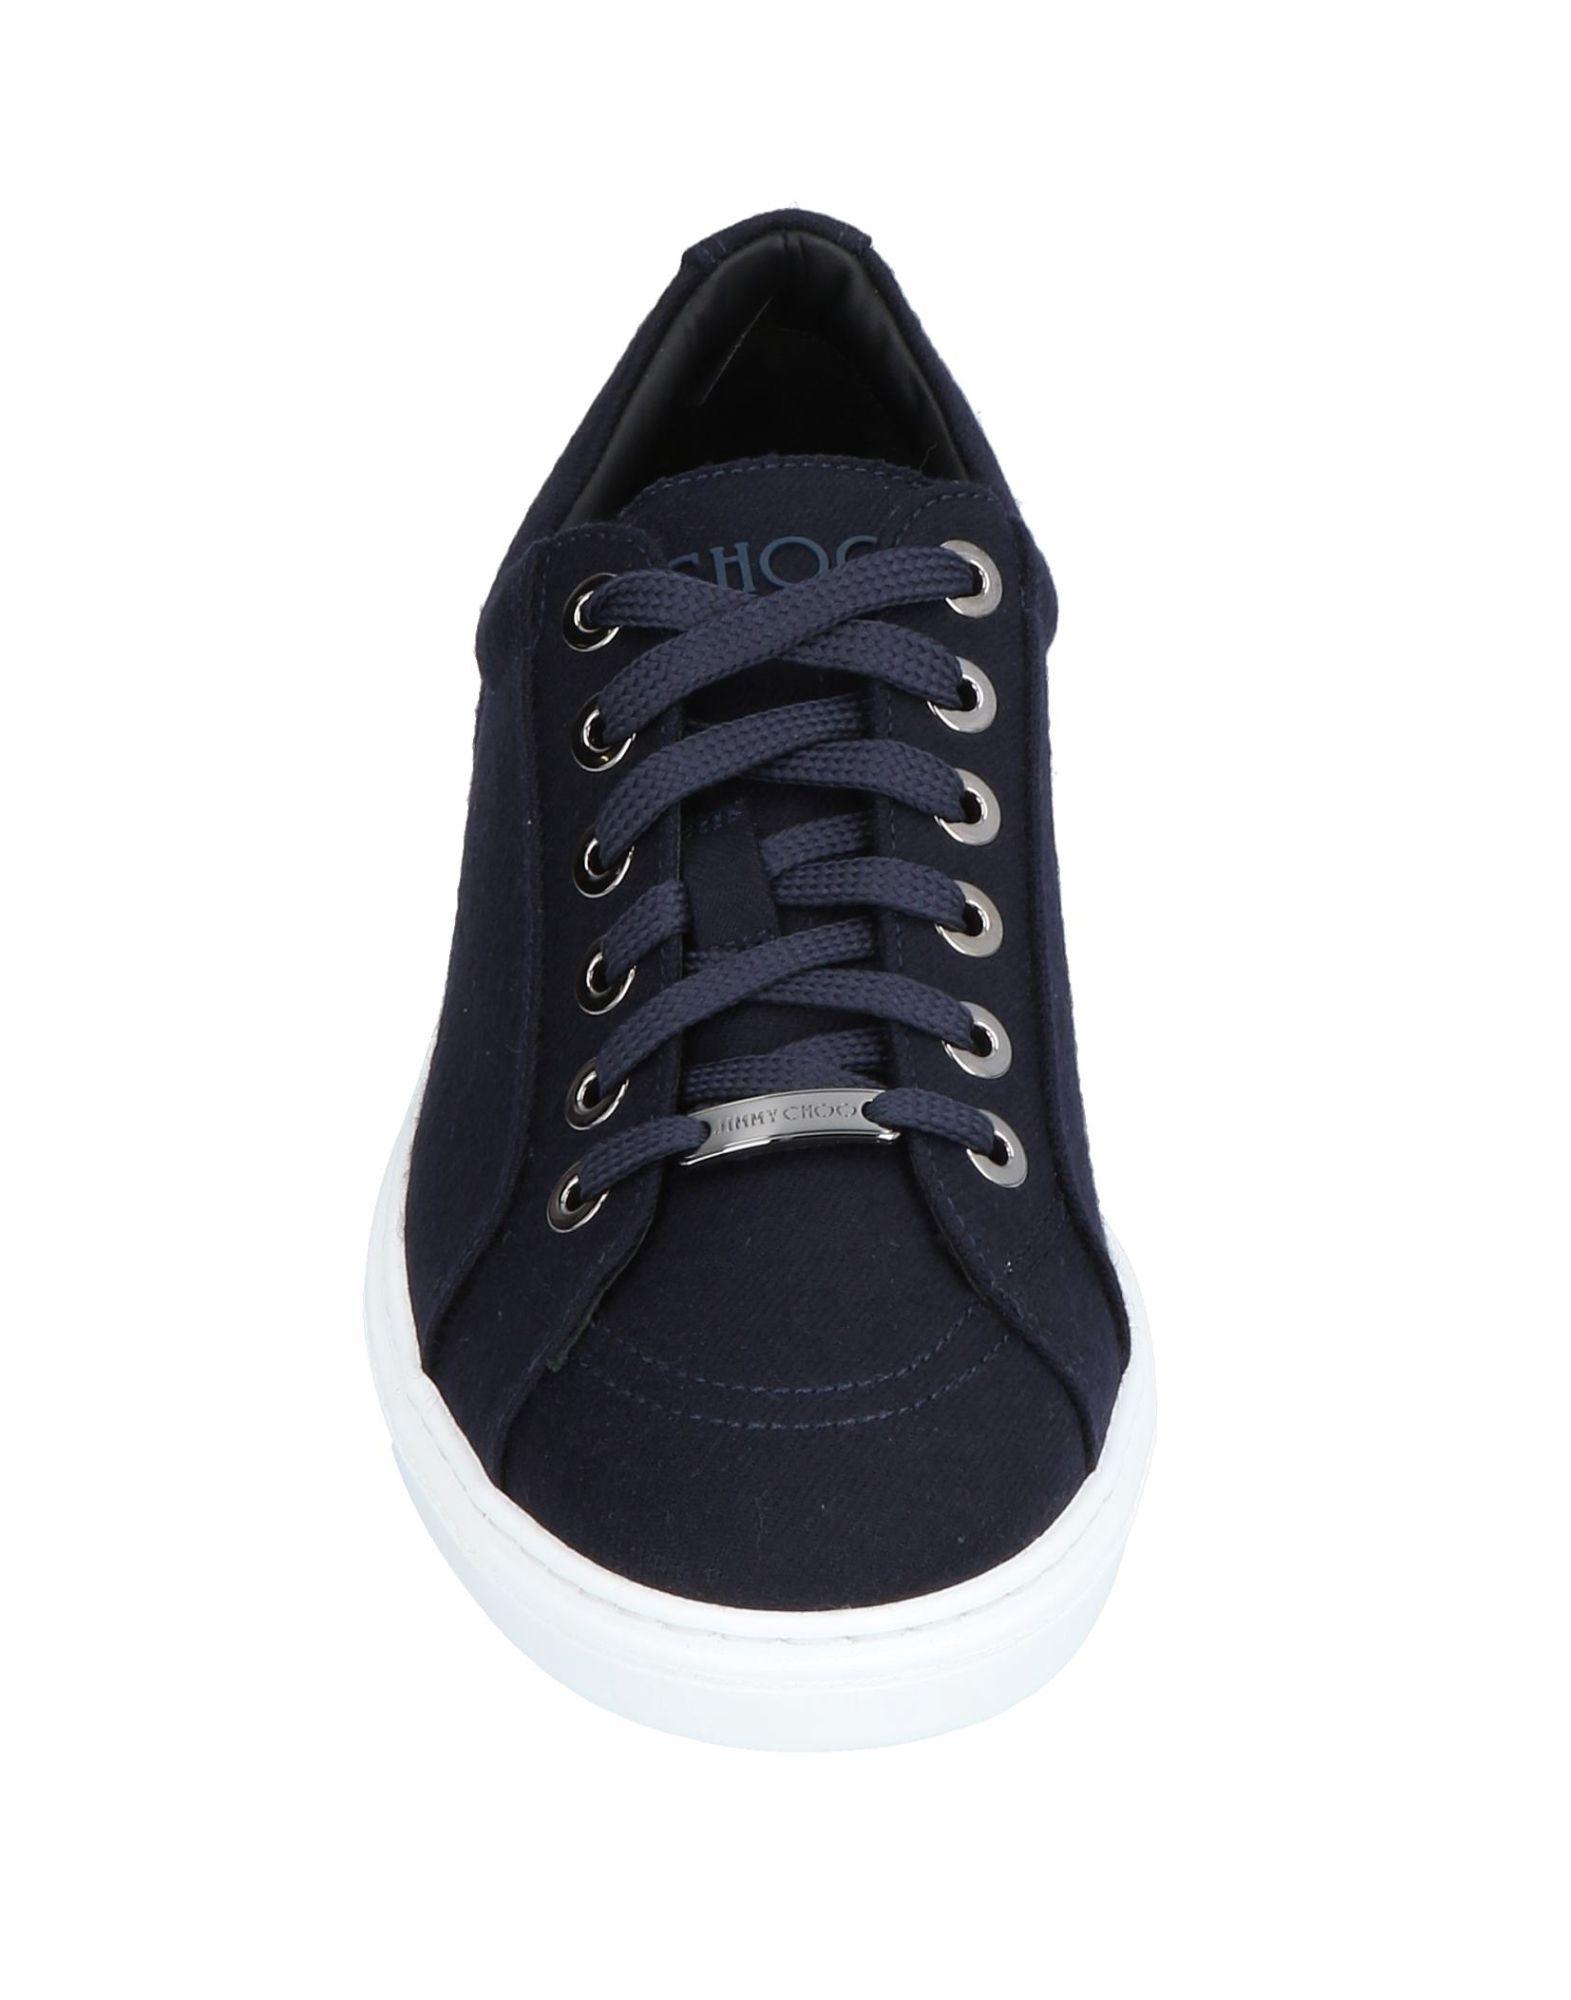 Jimmy 11485876KI Choo Sneakers Herren  11485876KI Jimmy Gute Qualität beliebte Schuhe c6fd5b